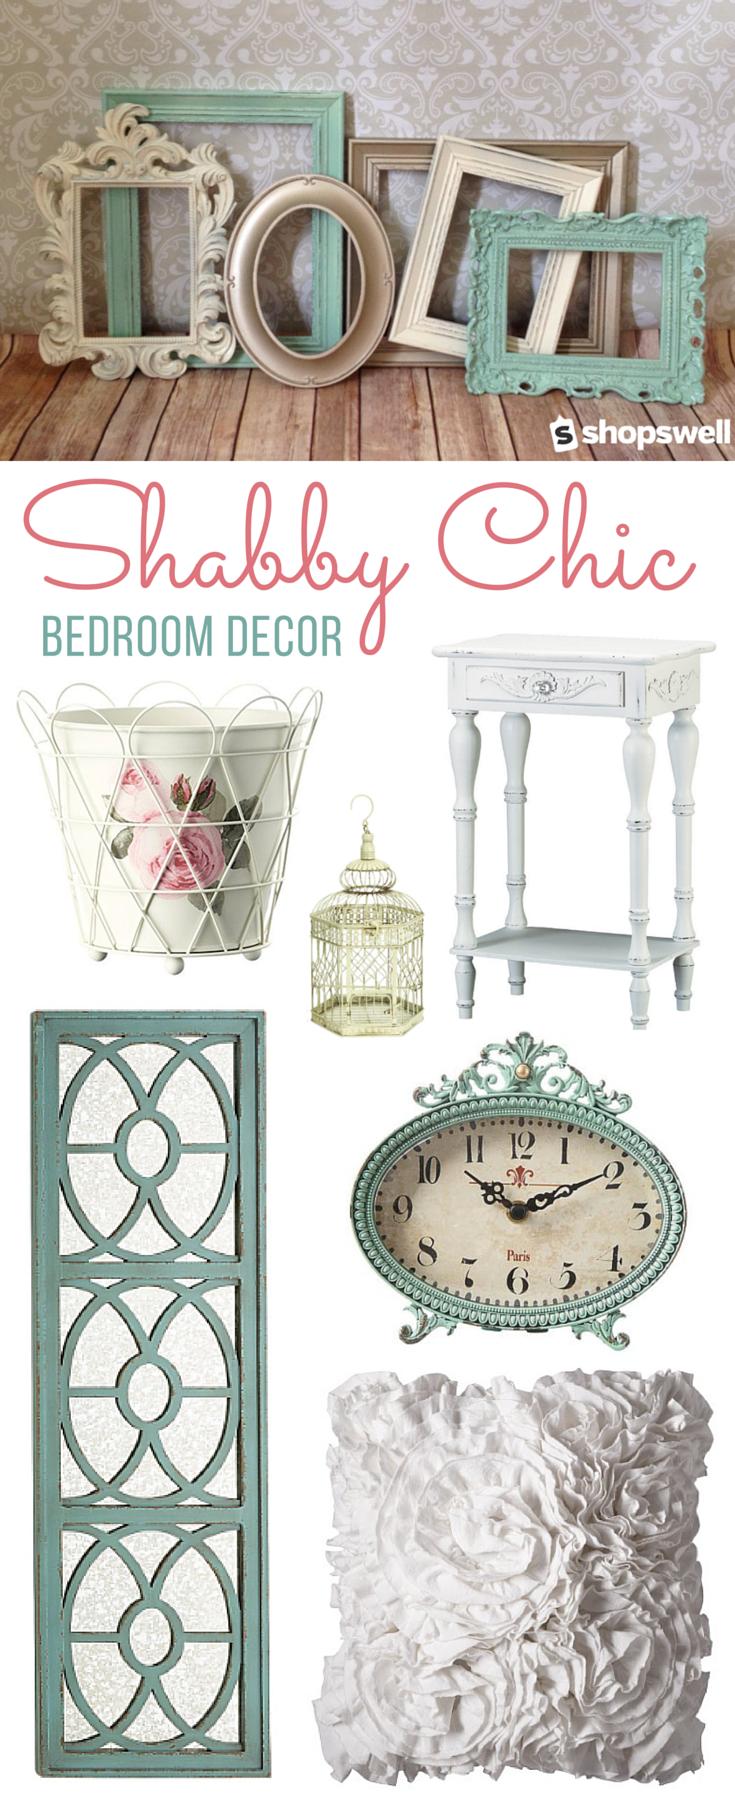 Quadri Cucina Shabby Chic.20 Home Decor Essentials For The Shabby Chic Bedroom